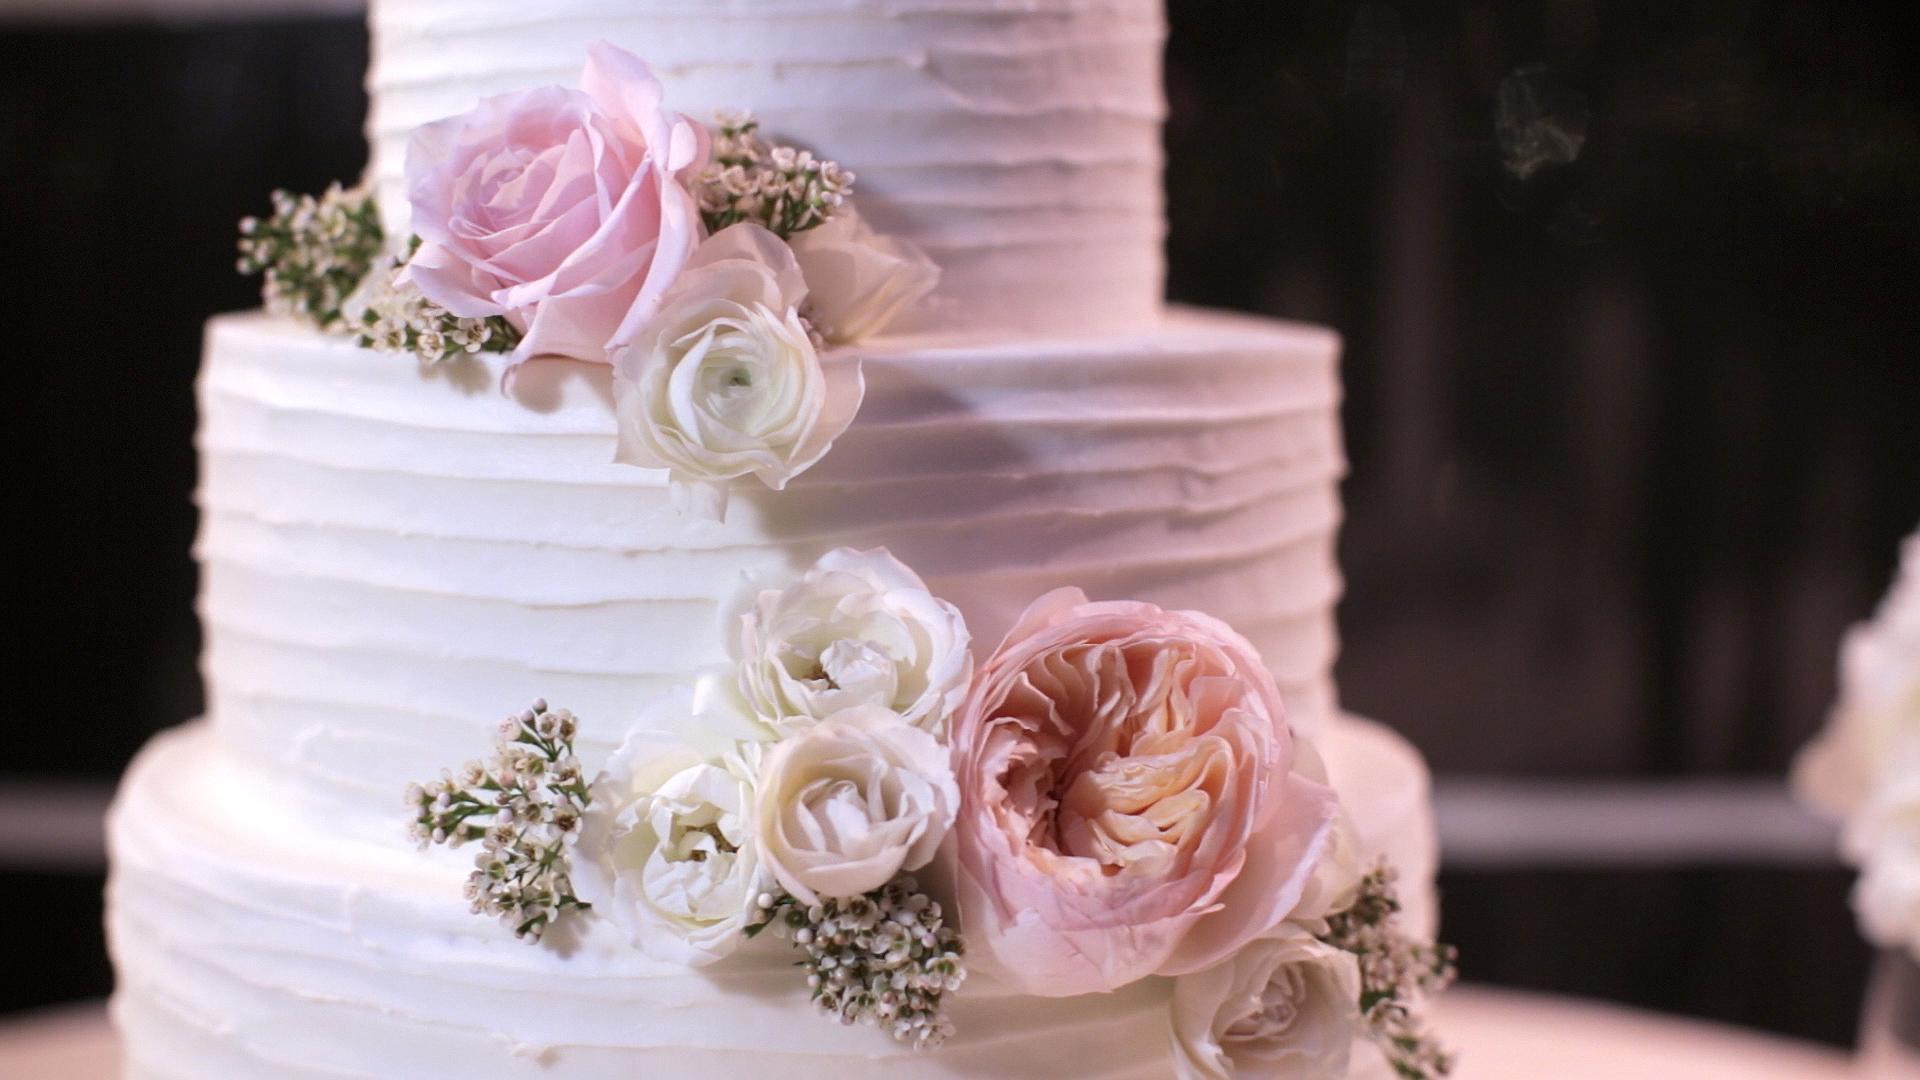 johnnyshannon-cake.jpg